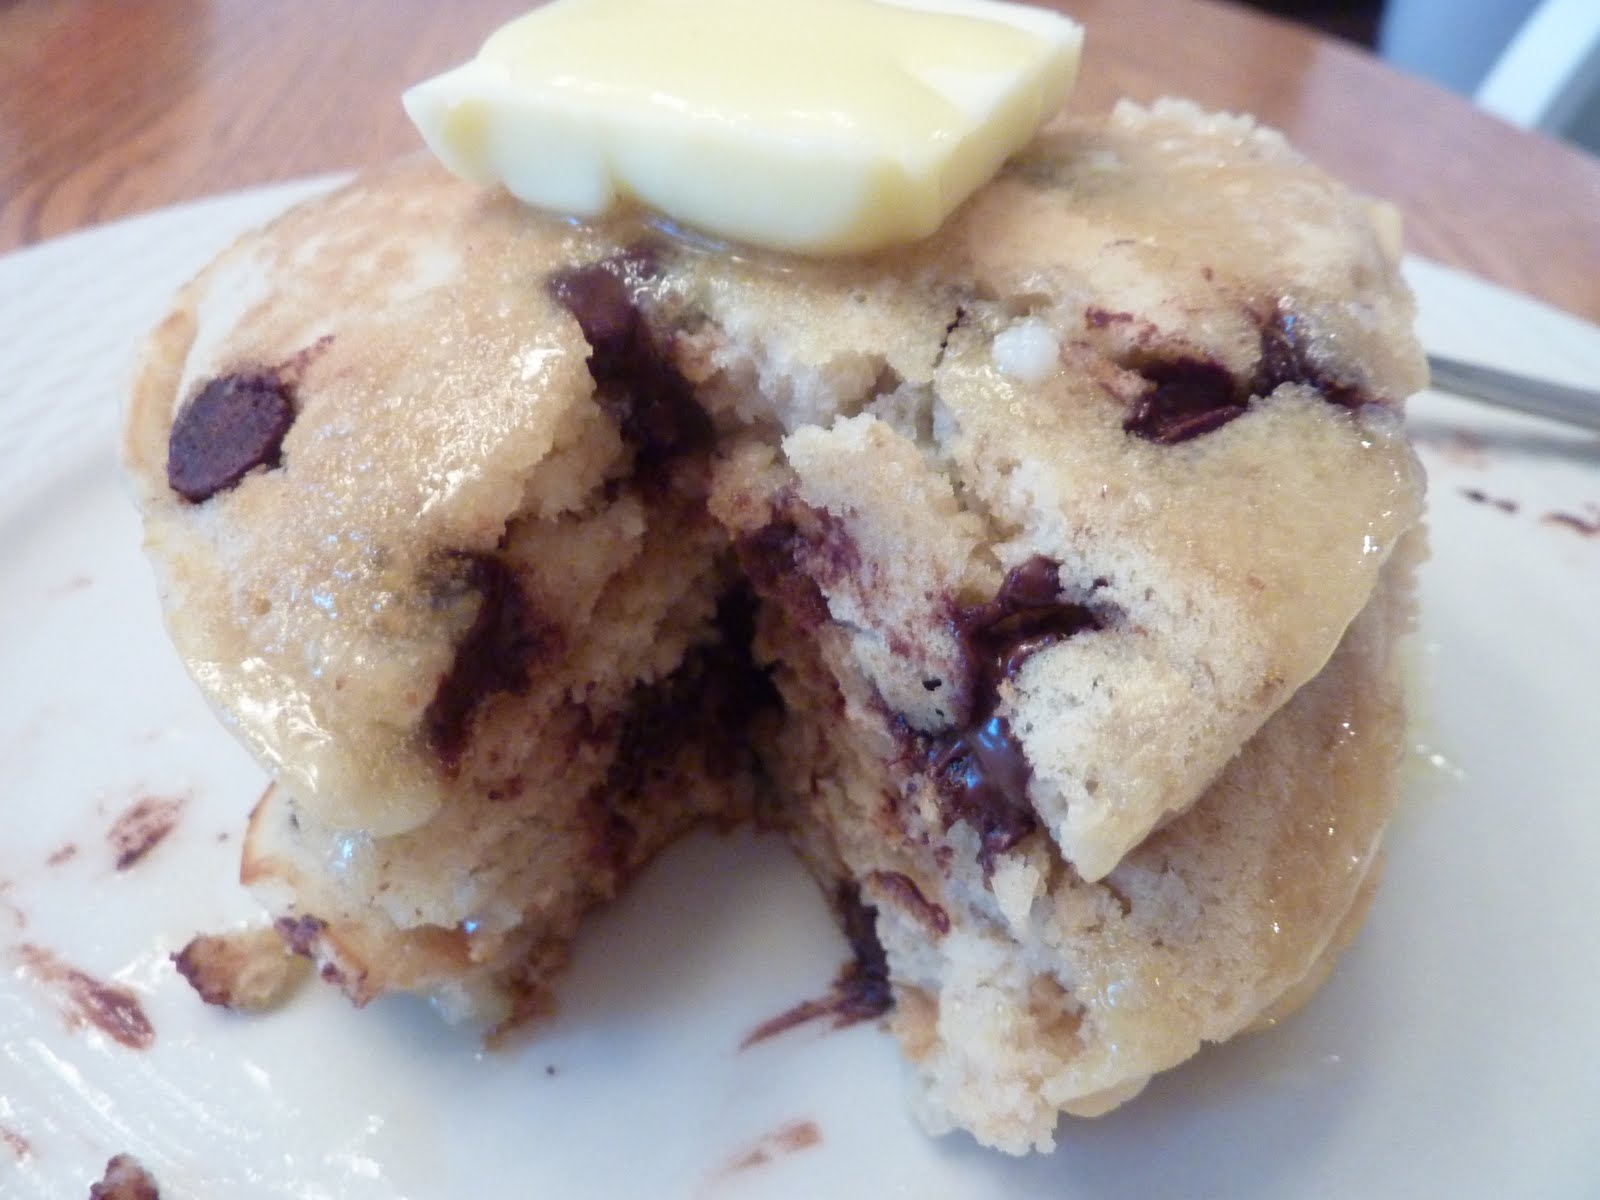 Kimmy's Kitchen: Oatmeal Chocolate Chip Pancakes